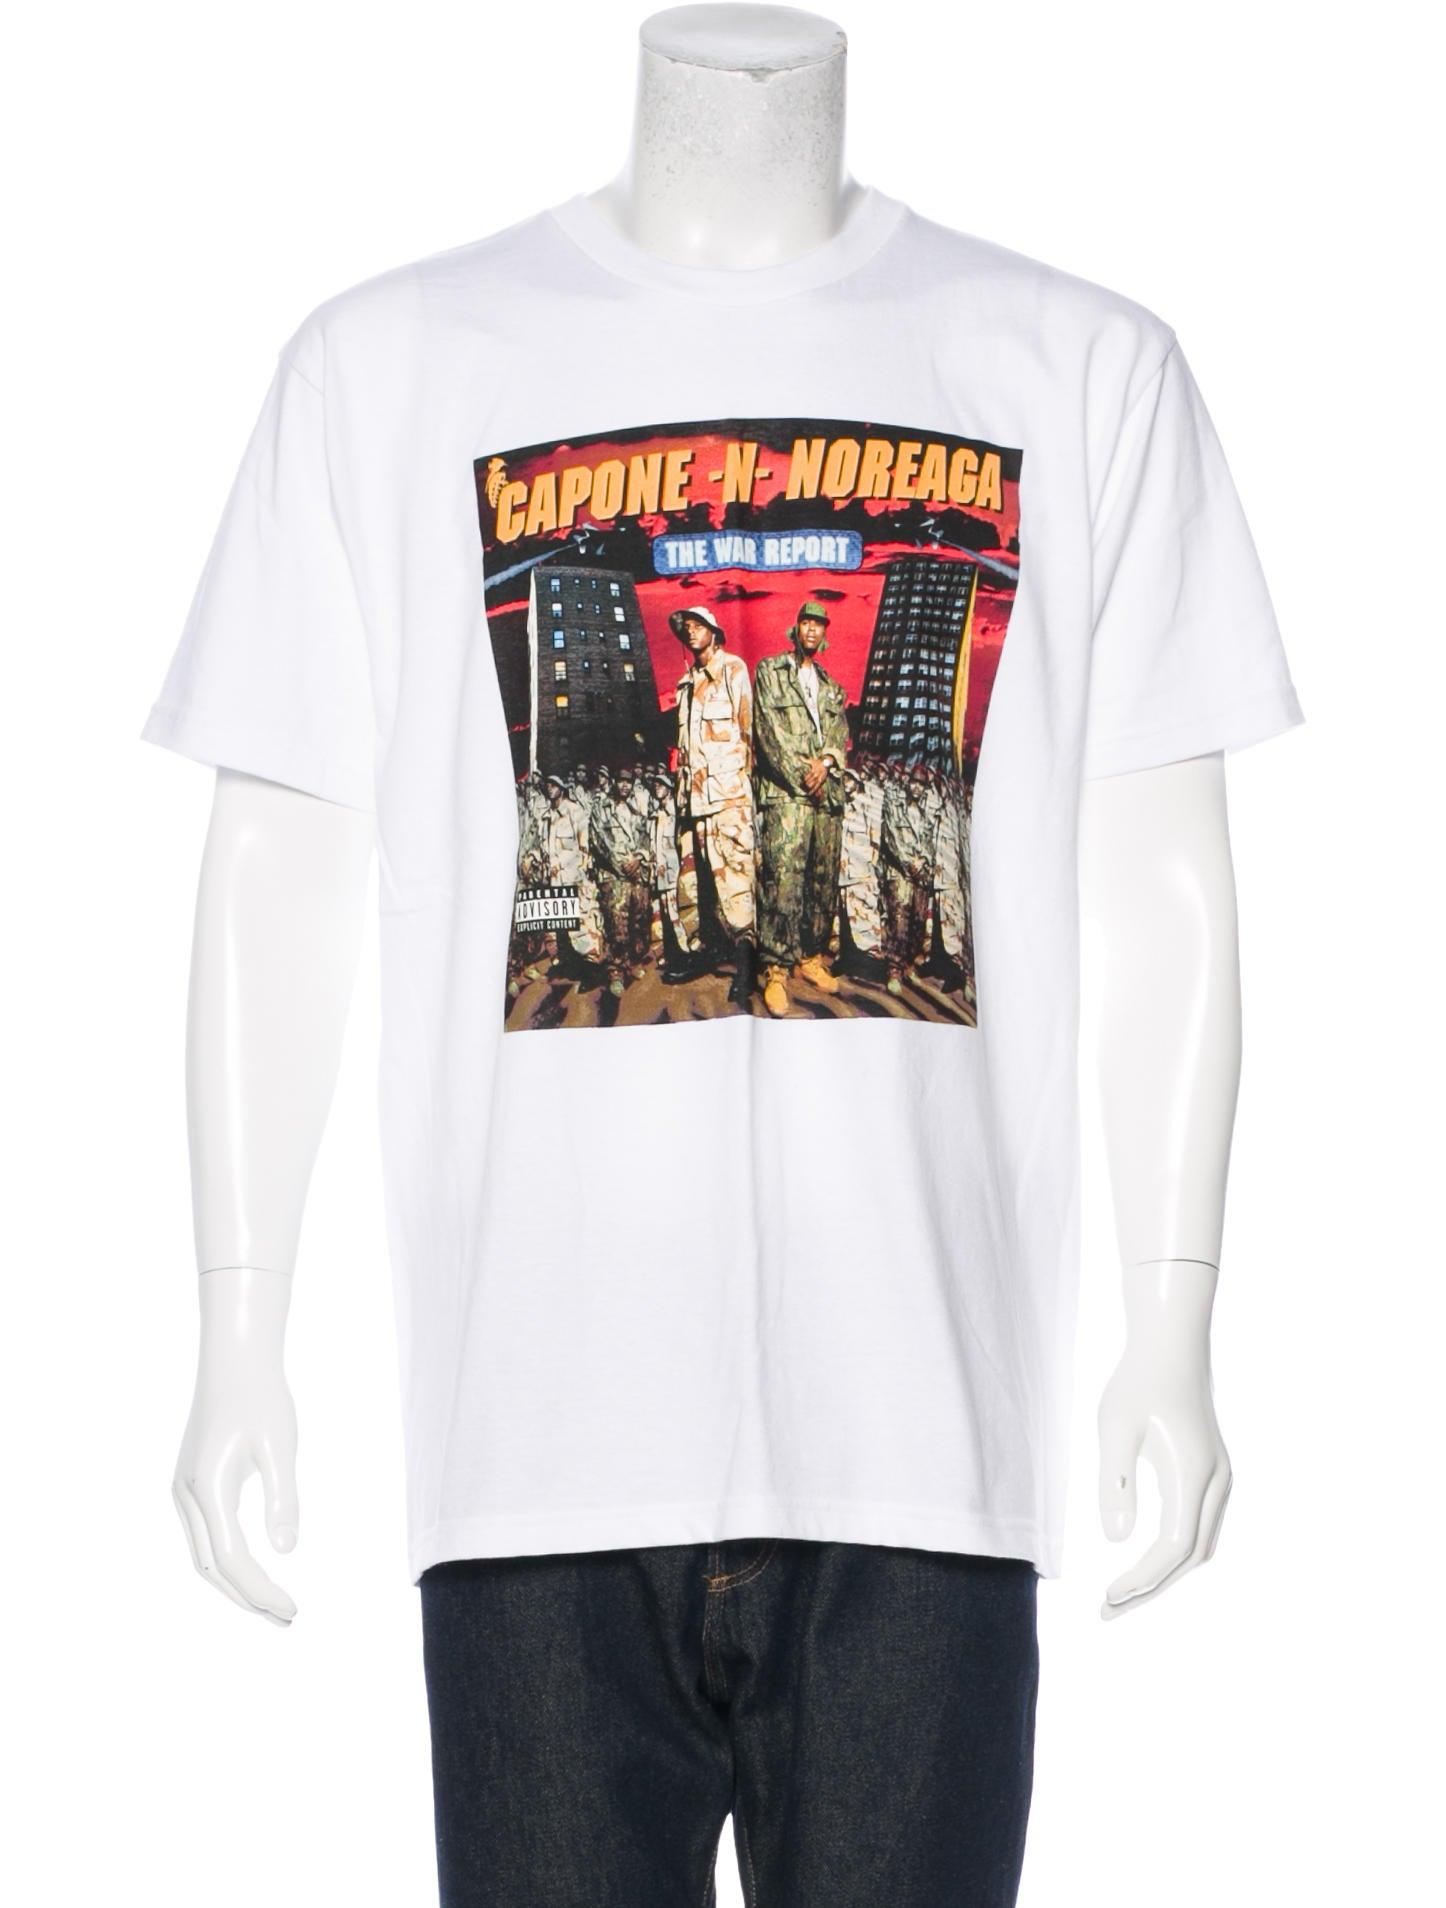 0ea3abe2c91a Supreme 2016 Capone N Noreaga T-Shirt - Clothing - WSPME21343 | The ...